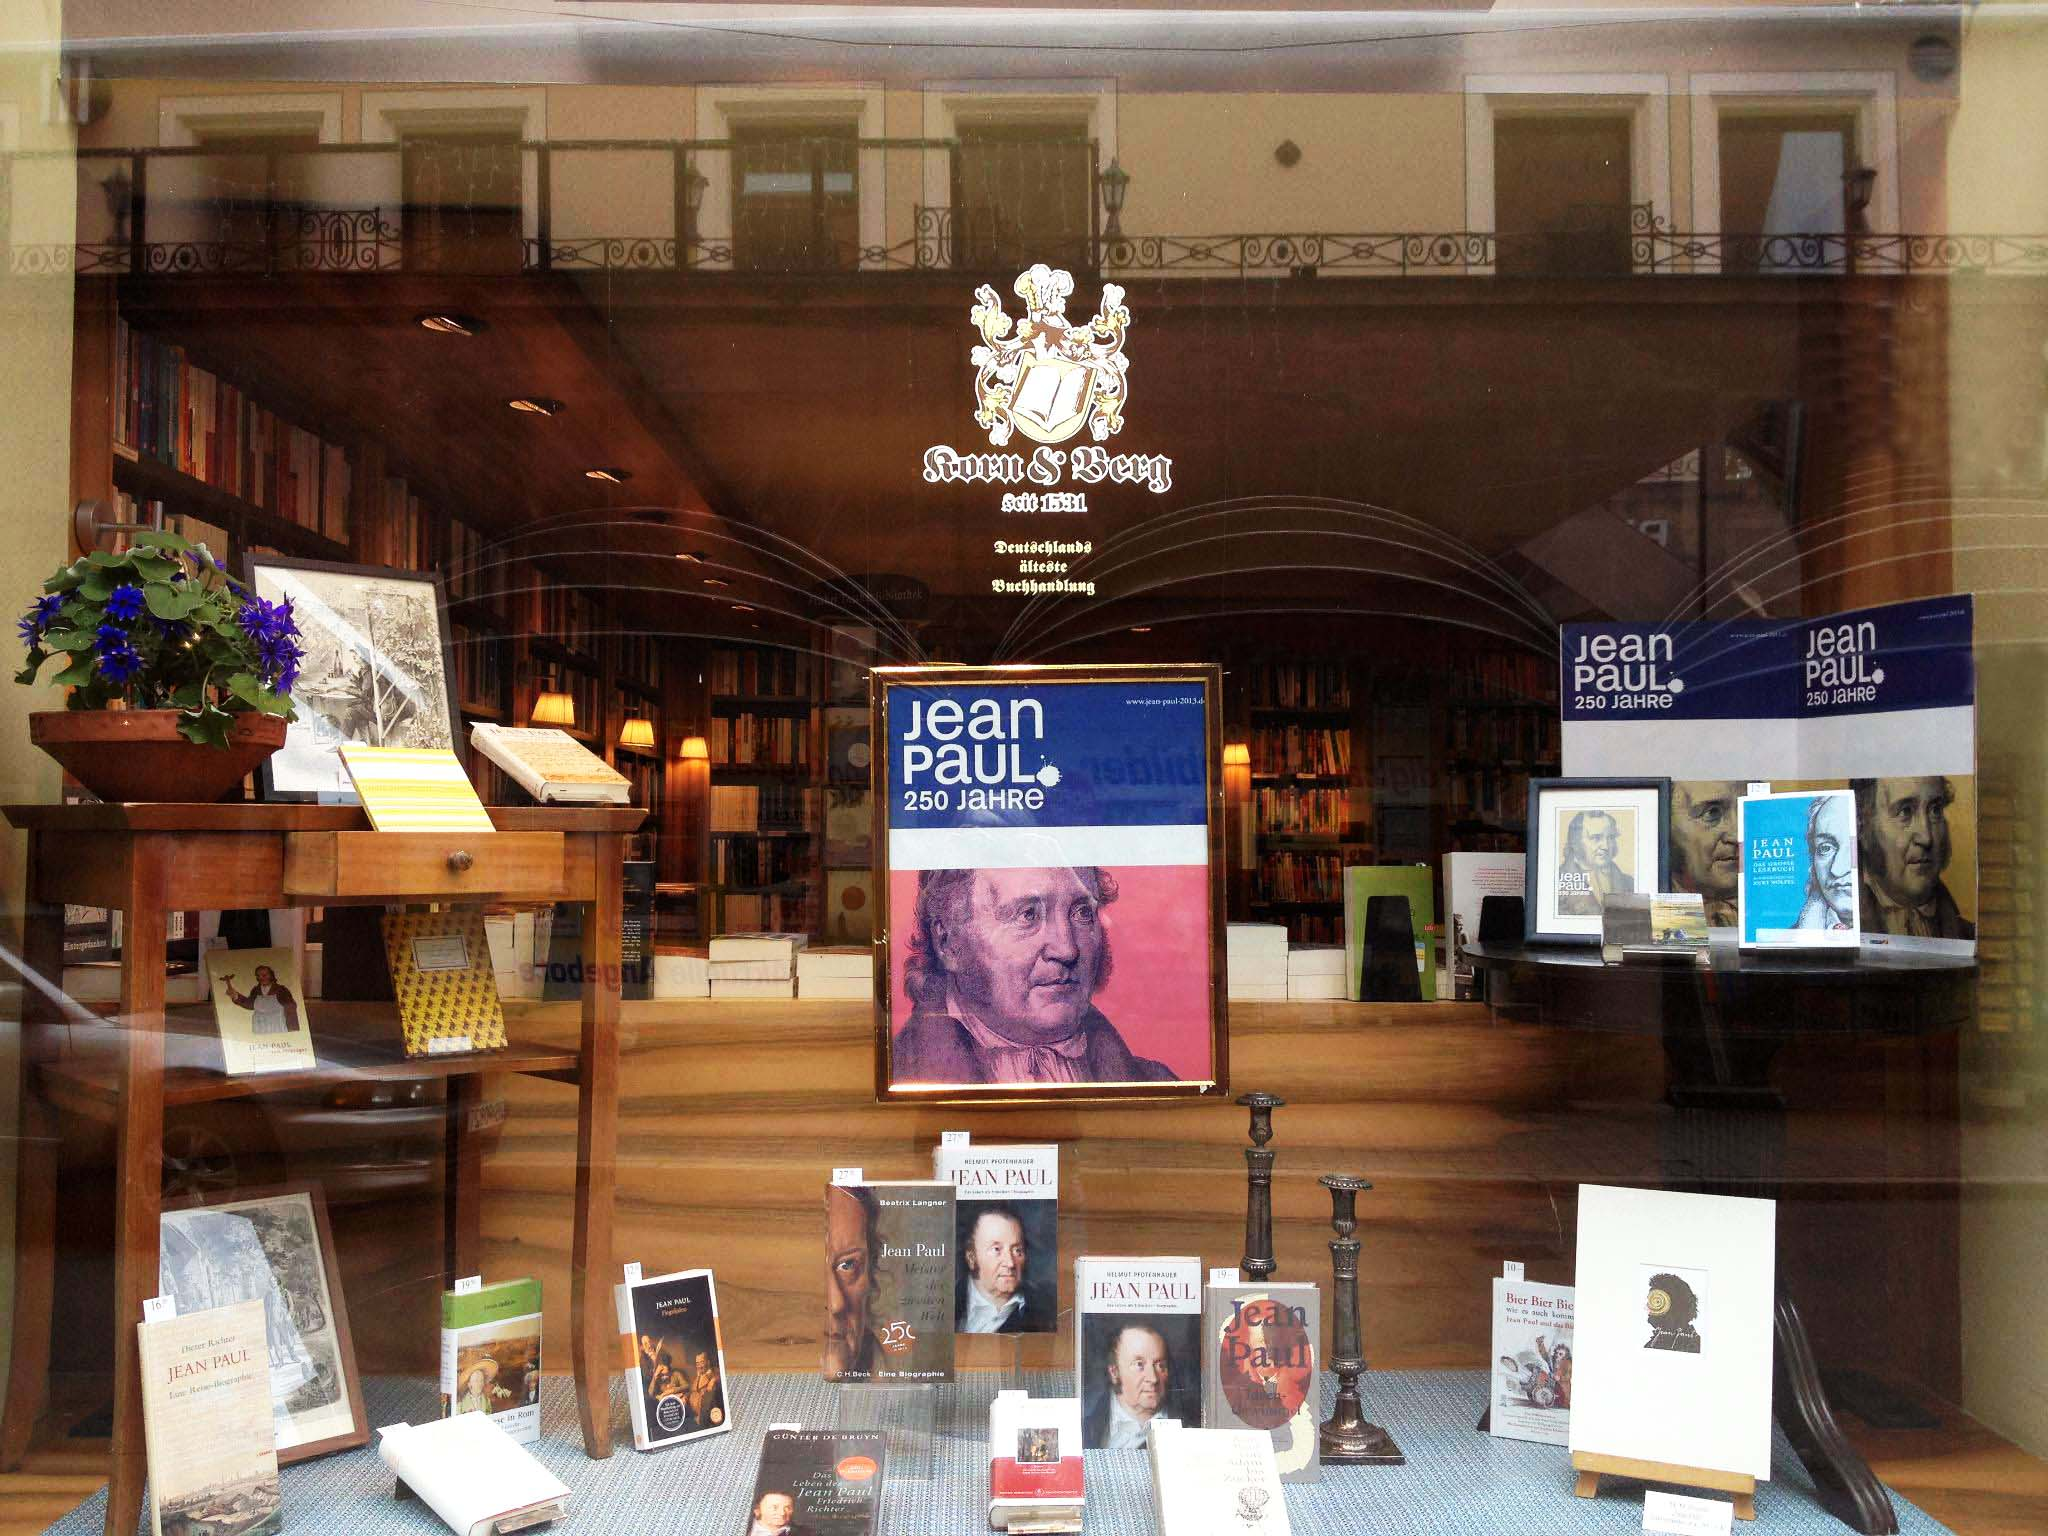 Jean-Paul-Schaufenster in Deutschlands ältester Buchhandlung Korn & Berg, Hauptmarkt Nürnberg, März 2013